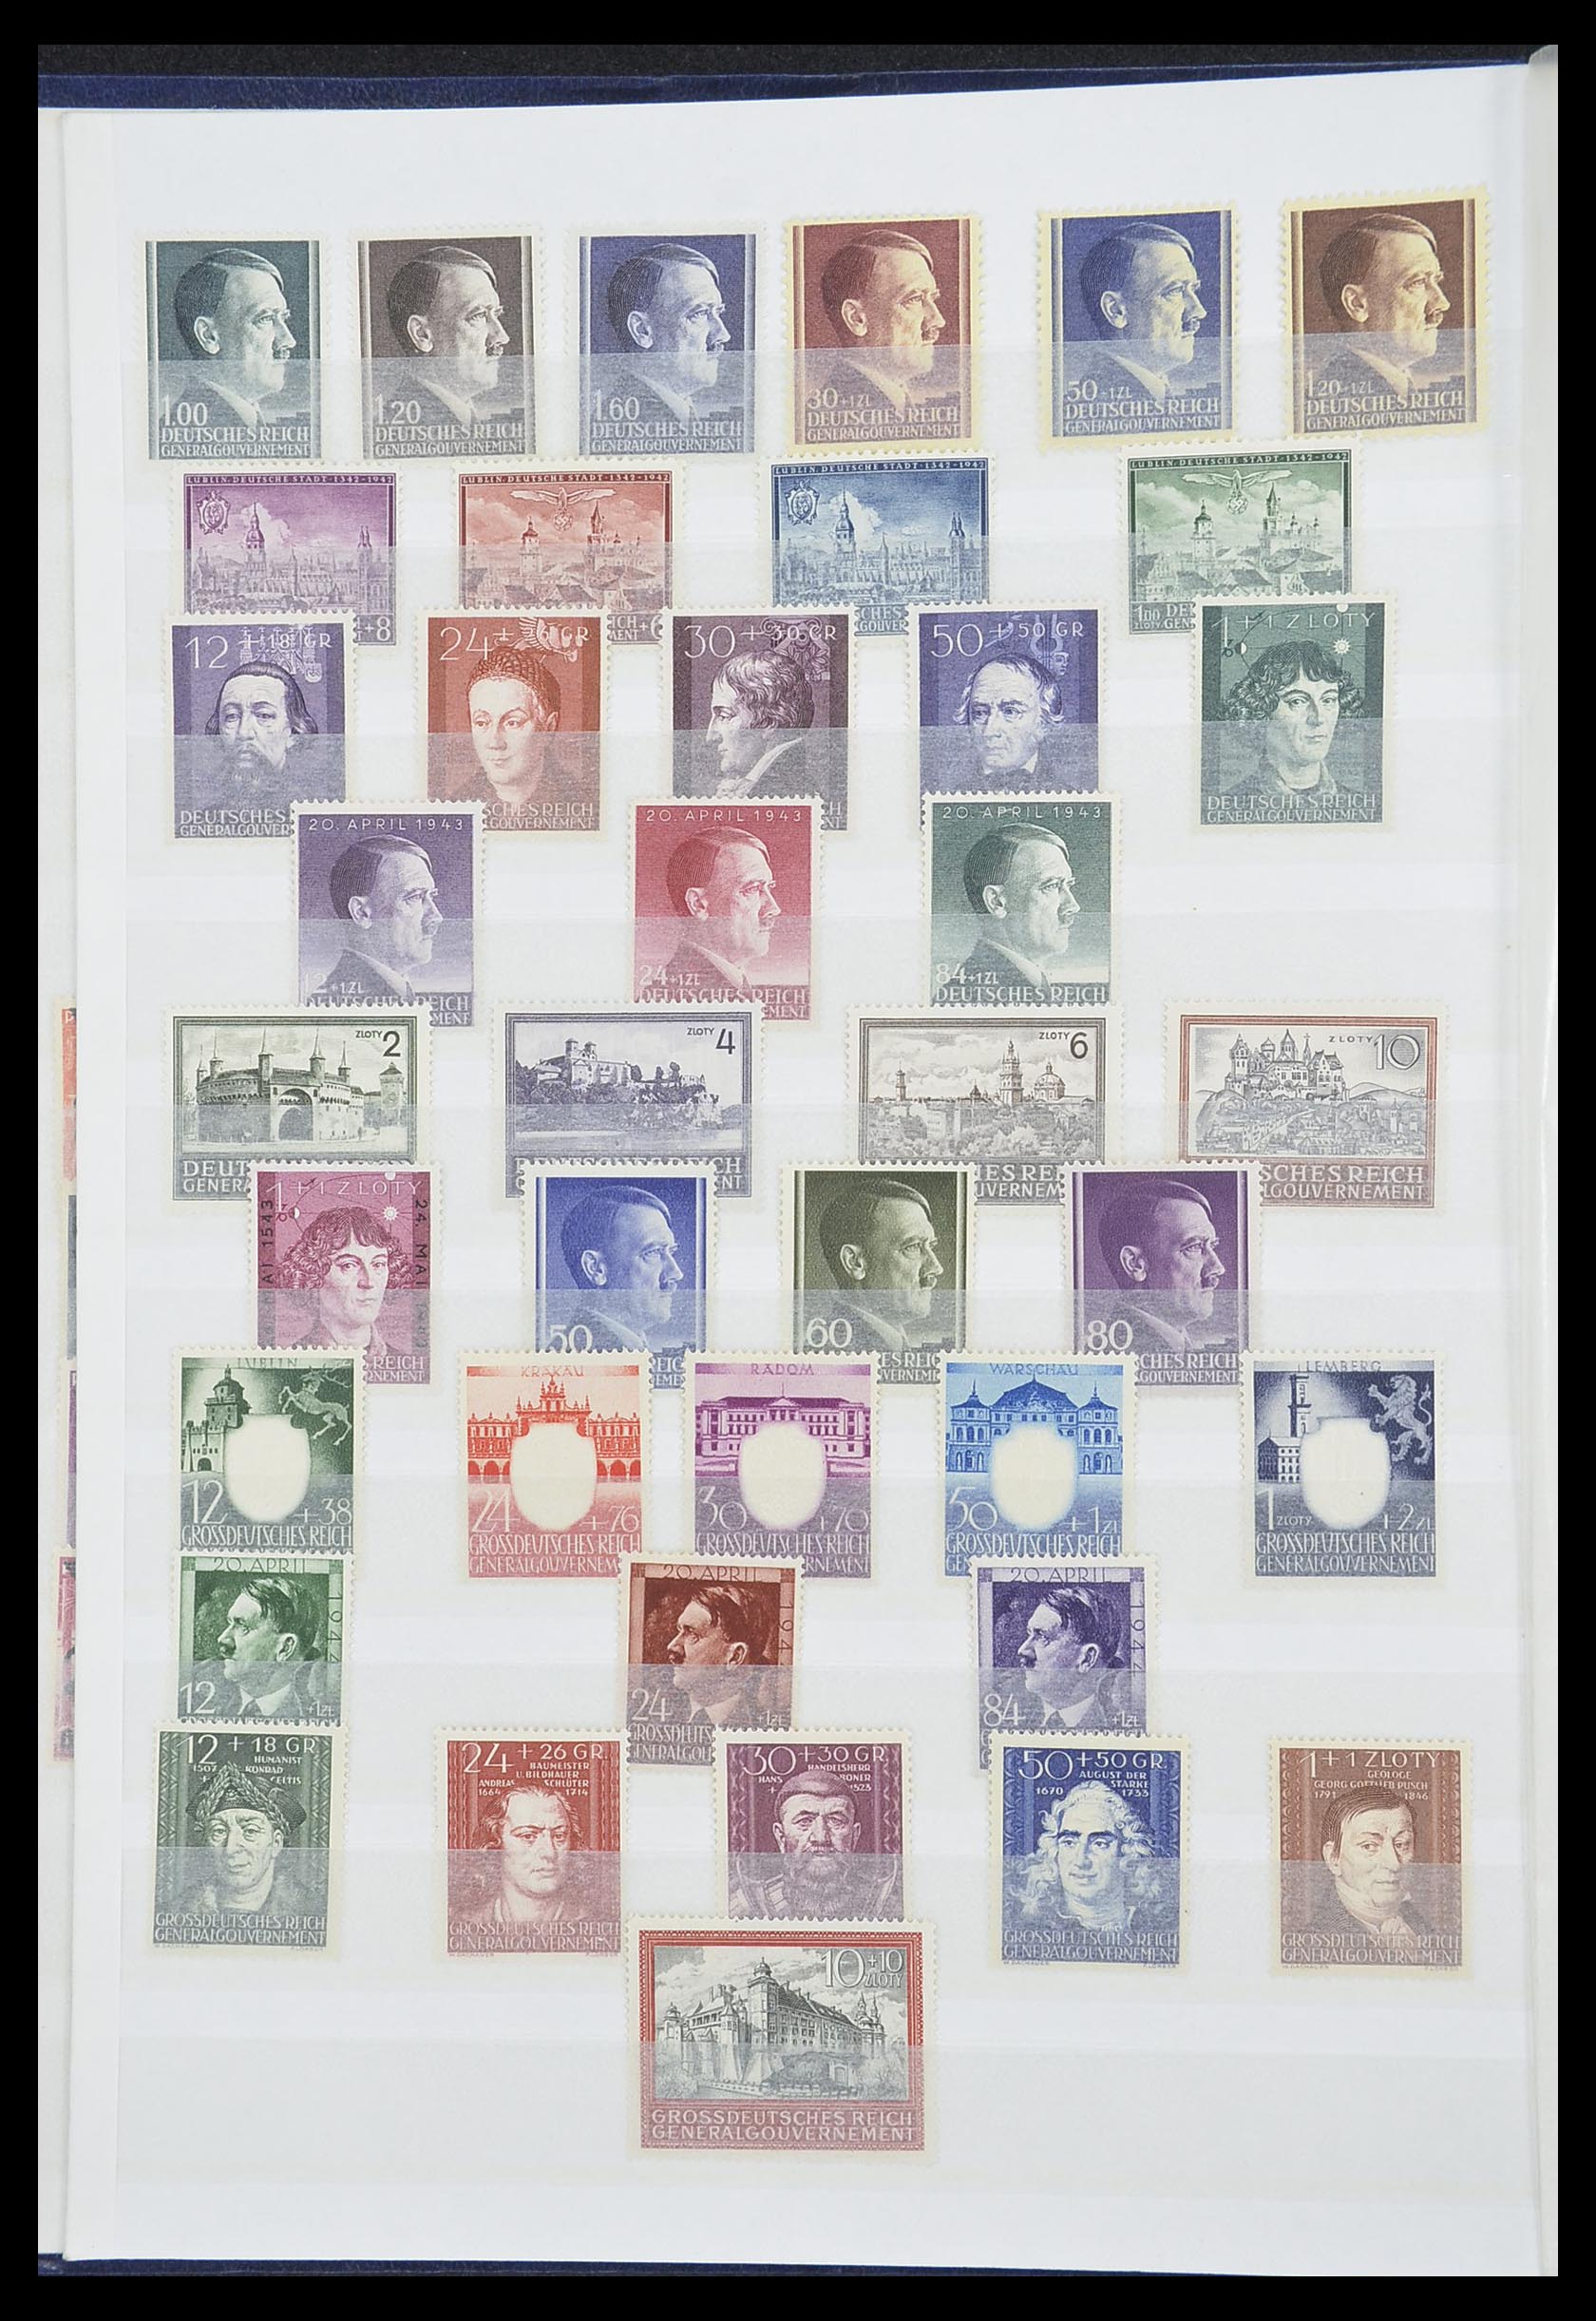 33850 003 - Postzegelverzameling 33850 Duitse bezettingen 2e wereldoorlog 1939-19